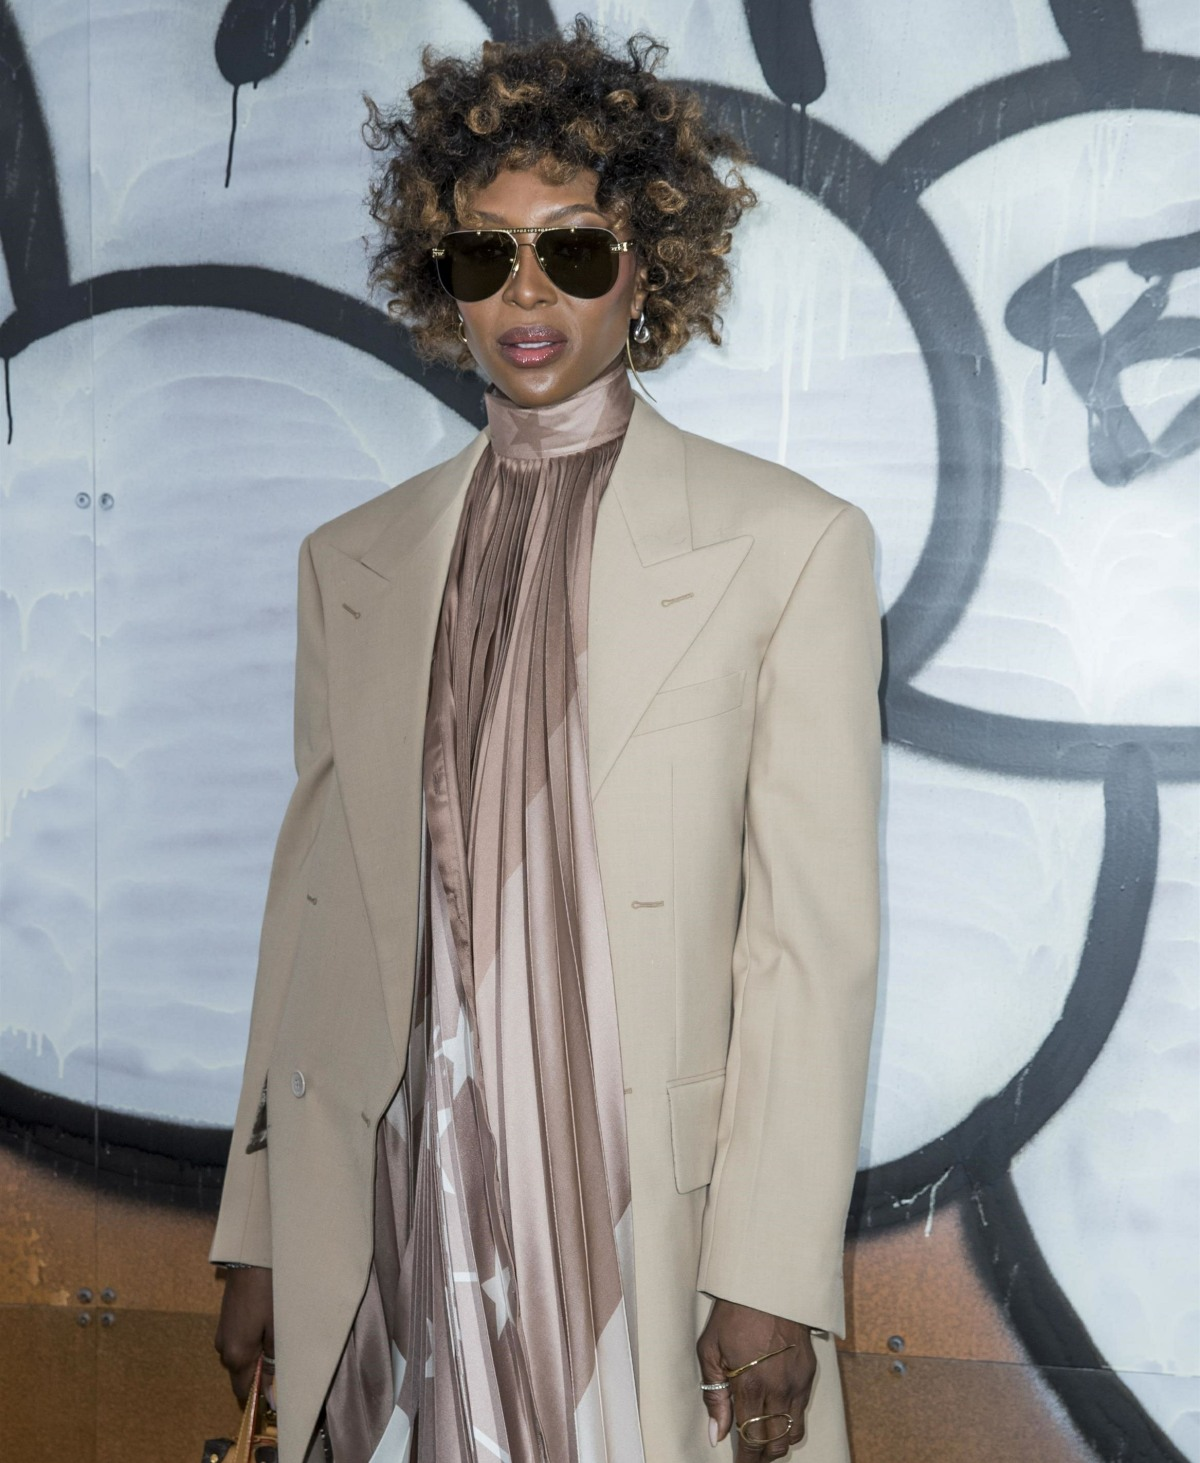 Louis Vuitton Men fashion show